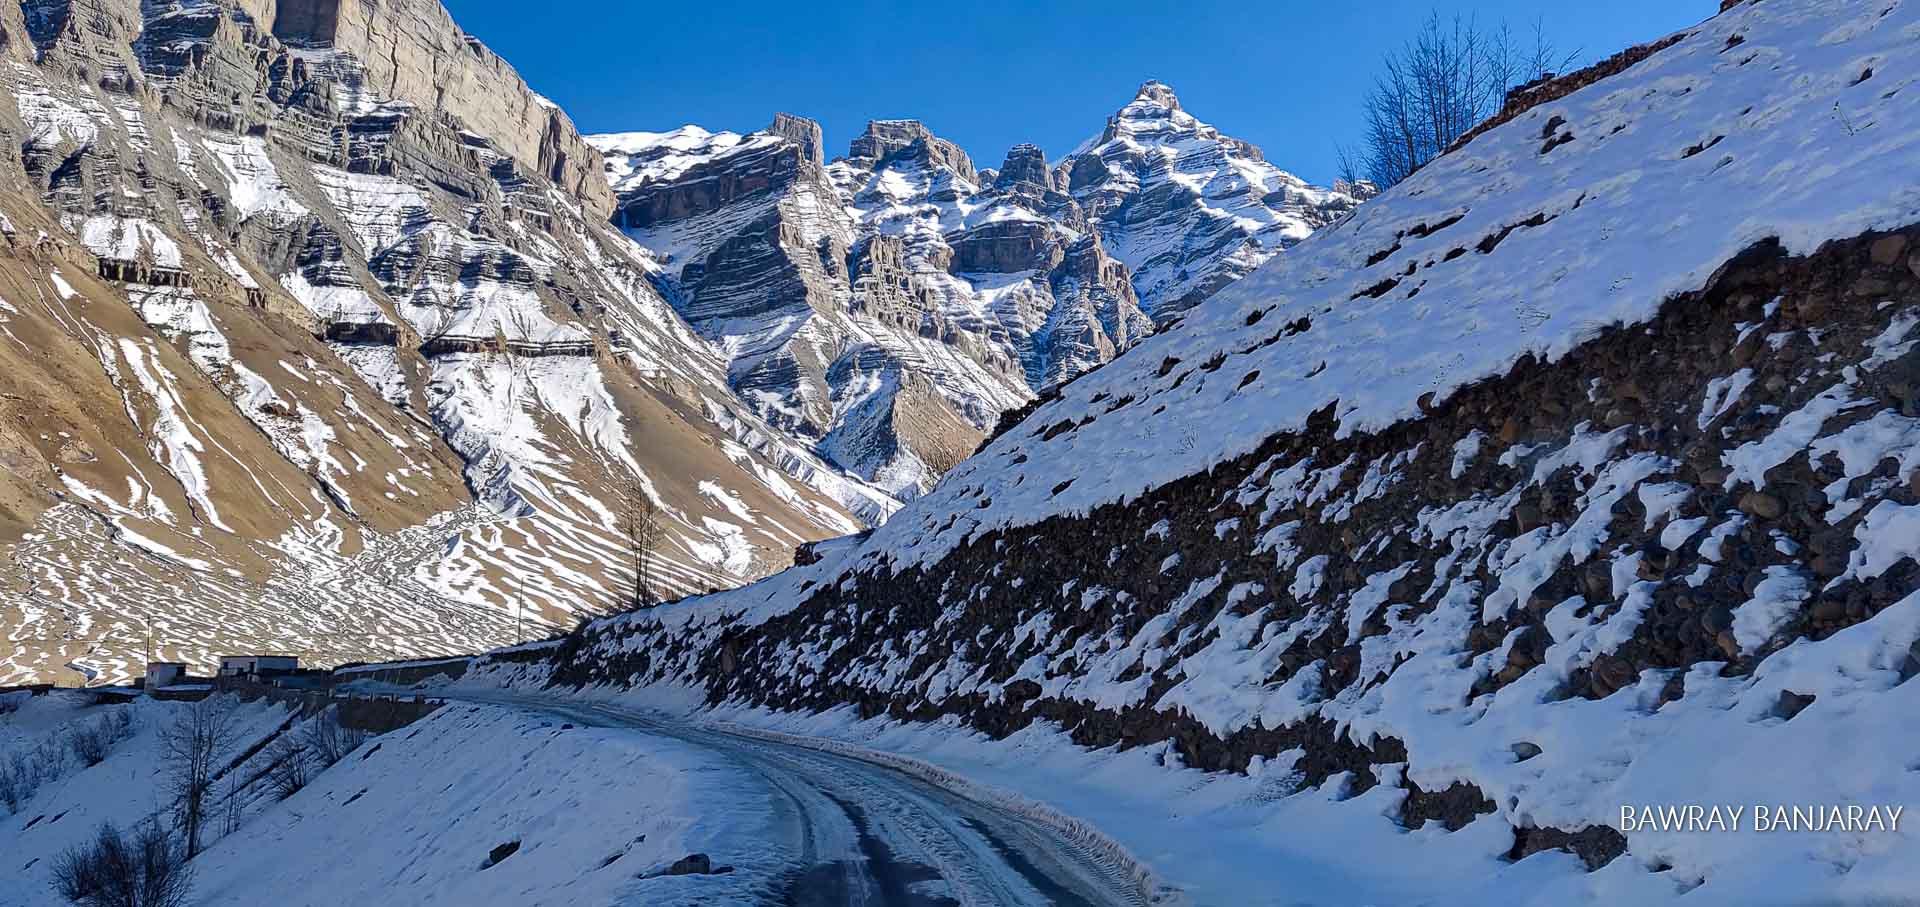 Icy roads of Winter Spiti